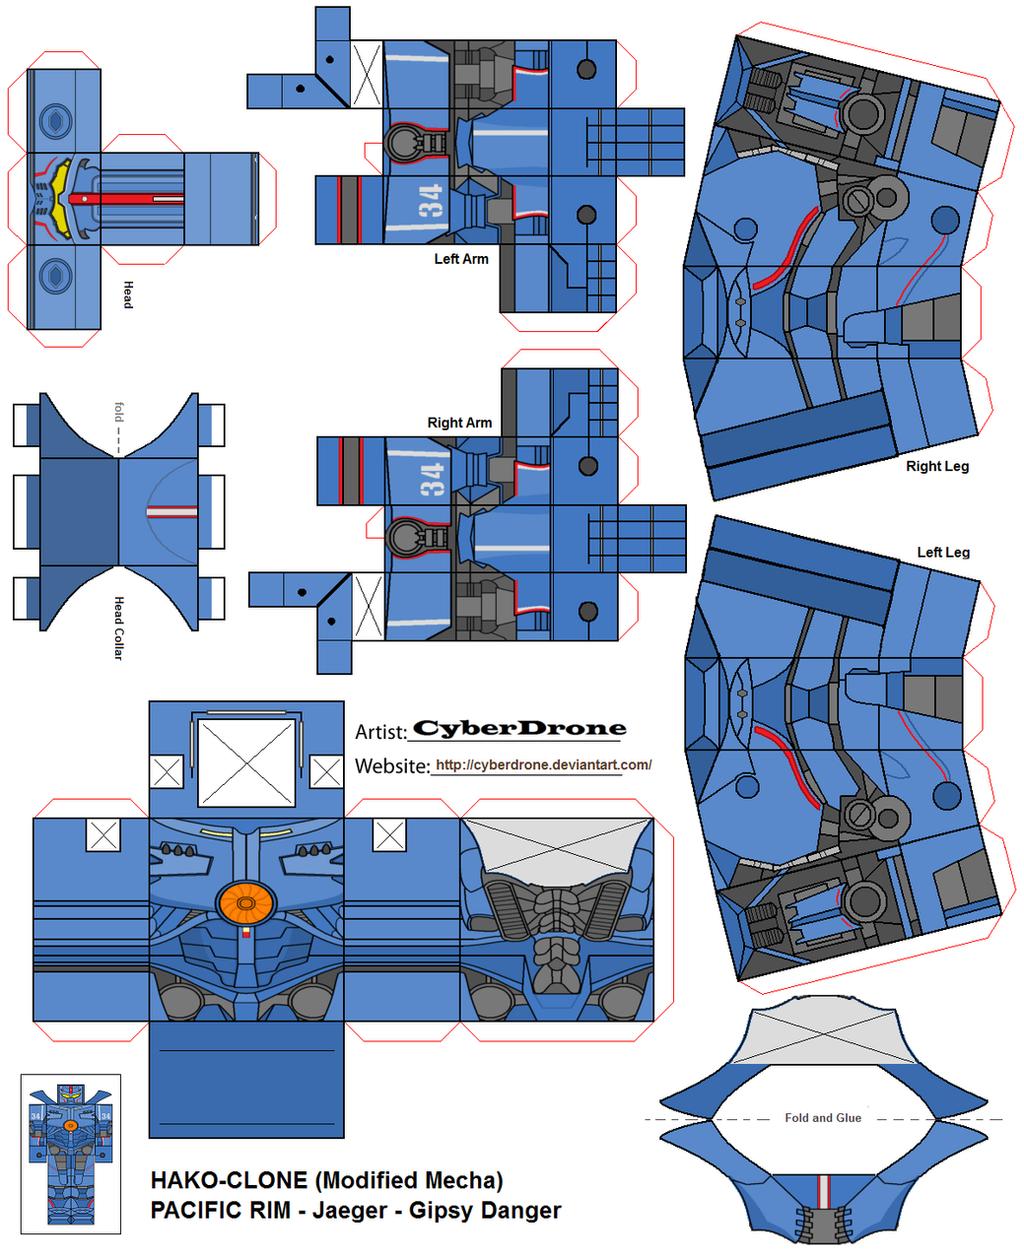 terminator wallpaper 4k